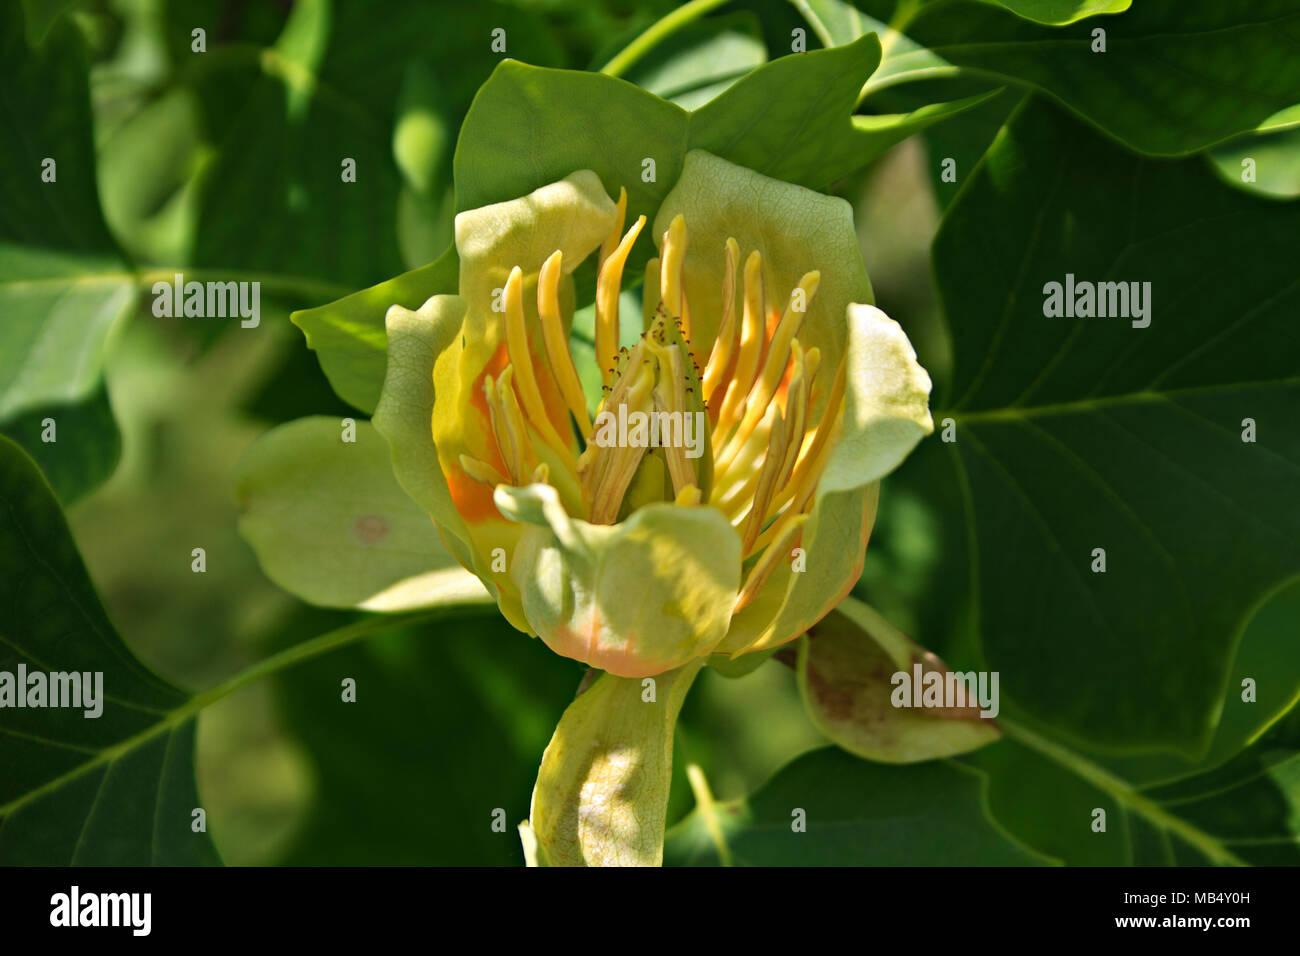 Tulip Poplar Stock Photos & Tulip Poplar Stock Images - Alamy